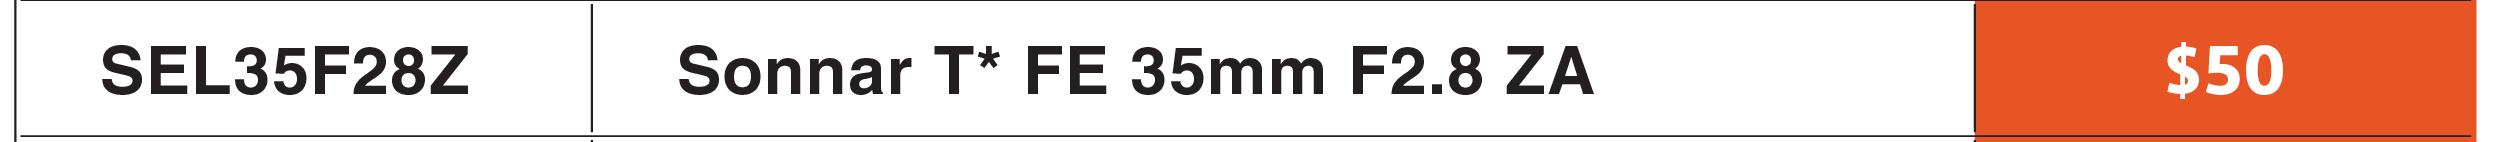 Sony SEL 35mm f/2.8 ZA